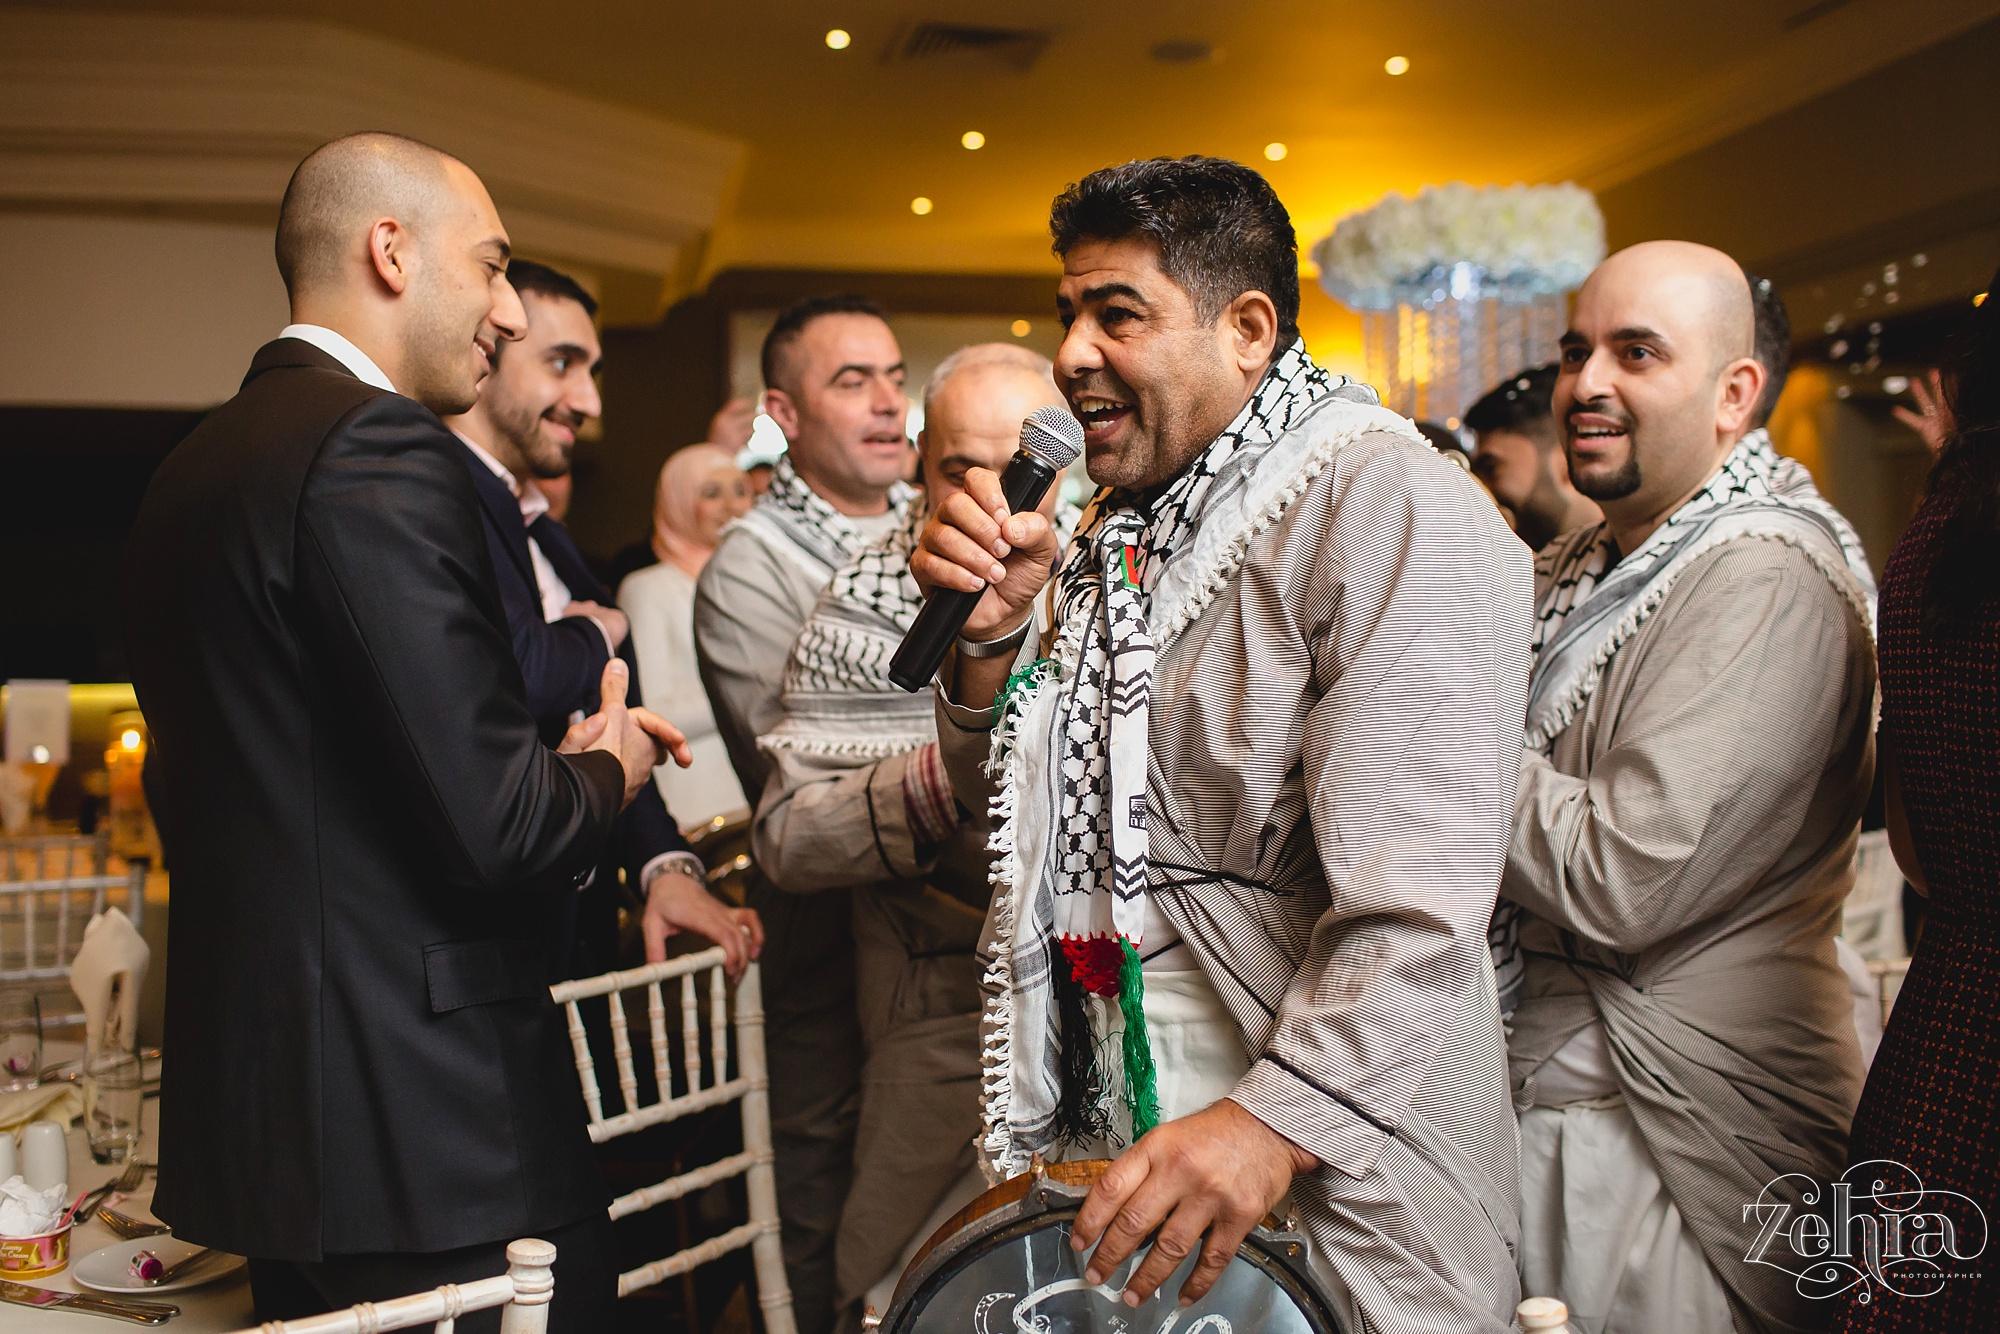 zehra photographer mere cheshire wedding_0028.jpg